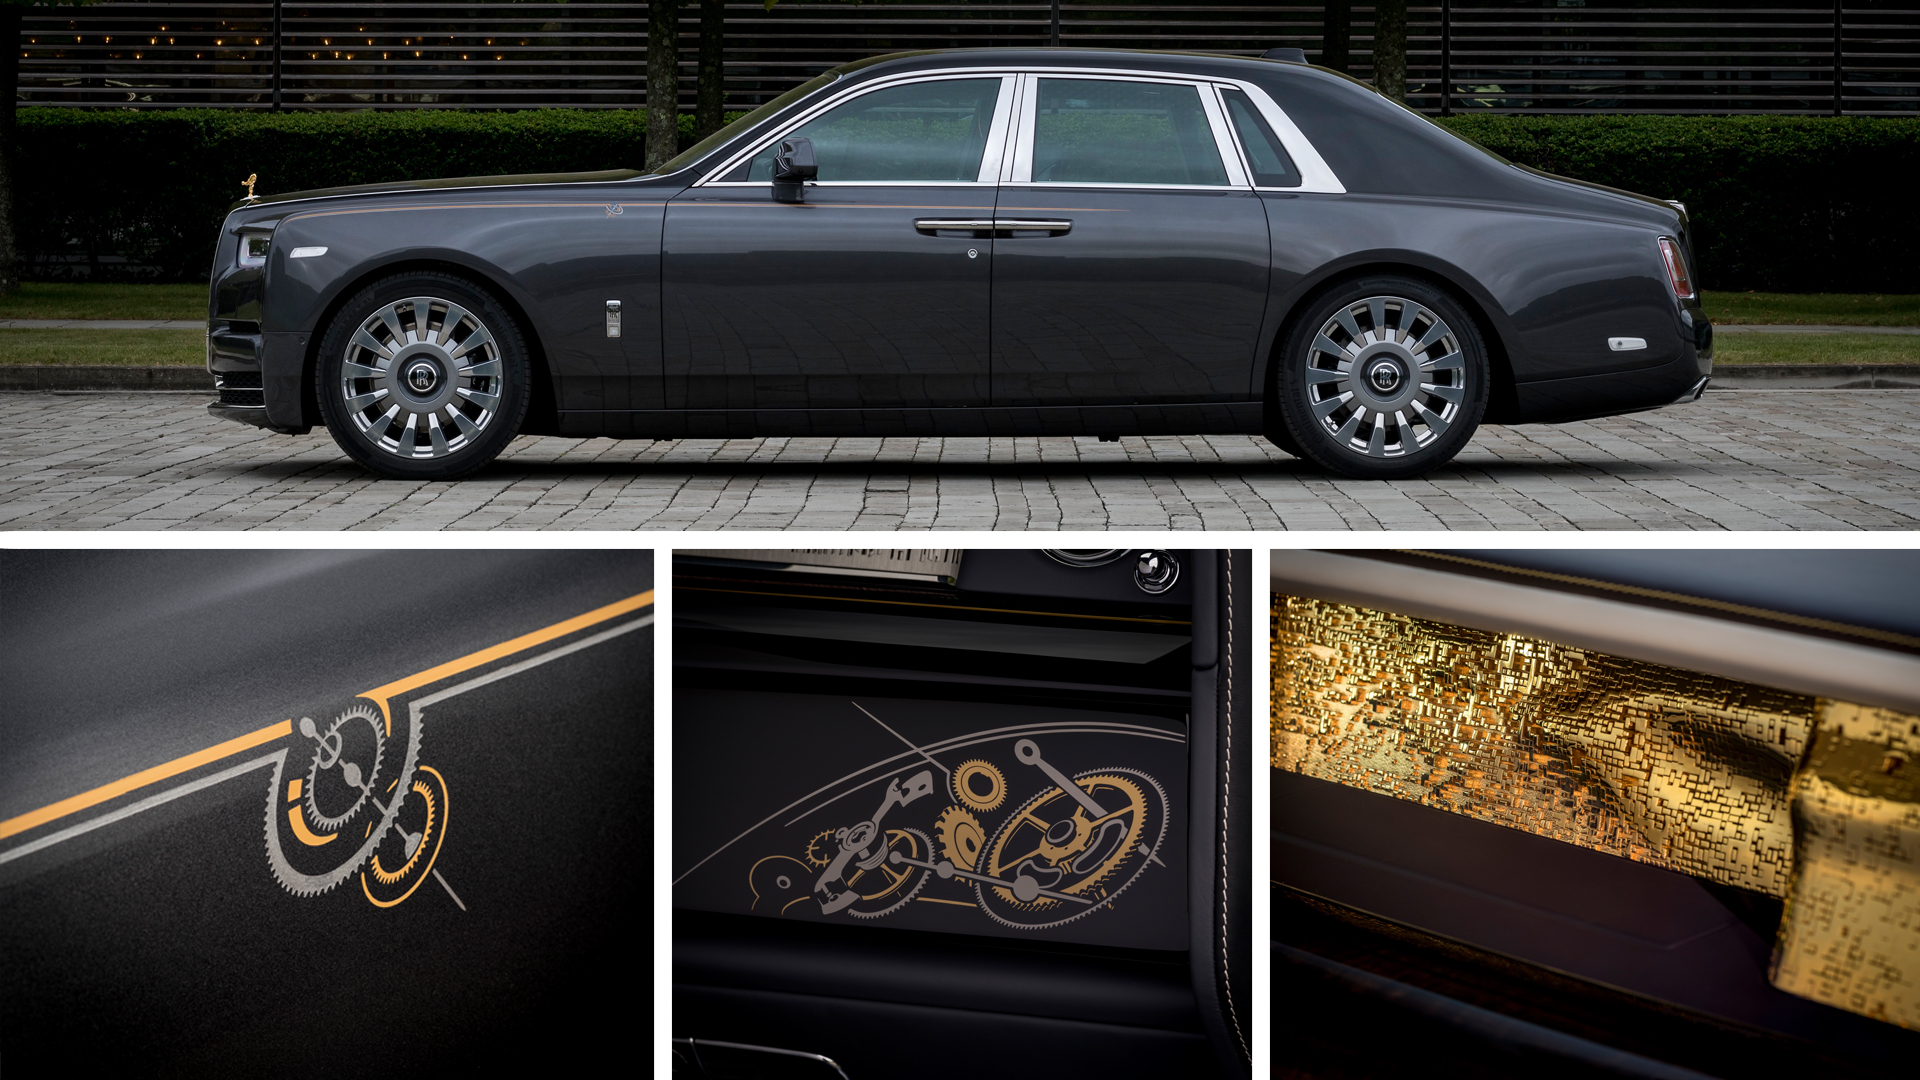 Horology Phantom Rolls-Royce